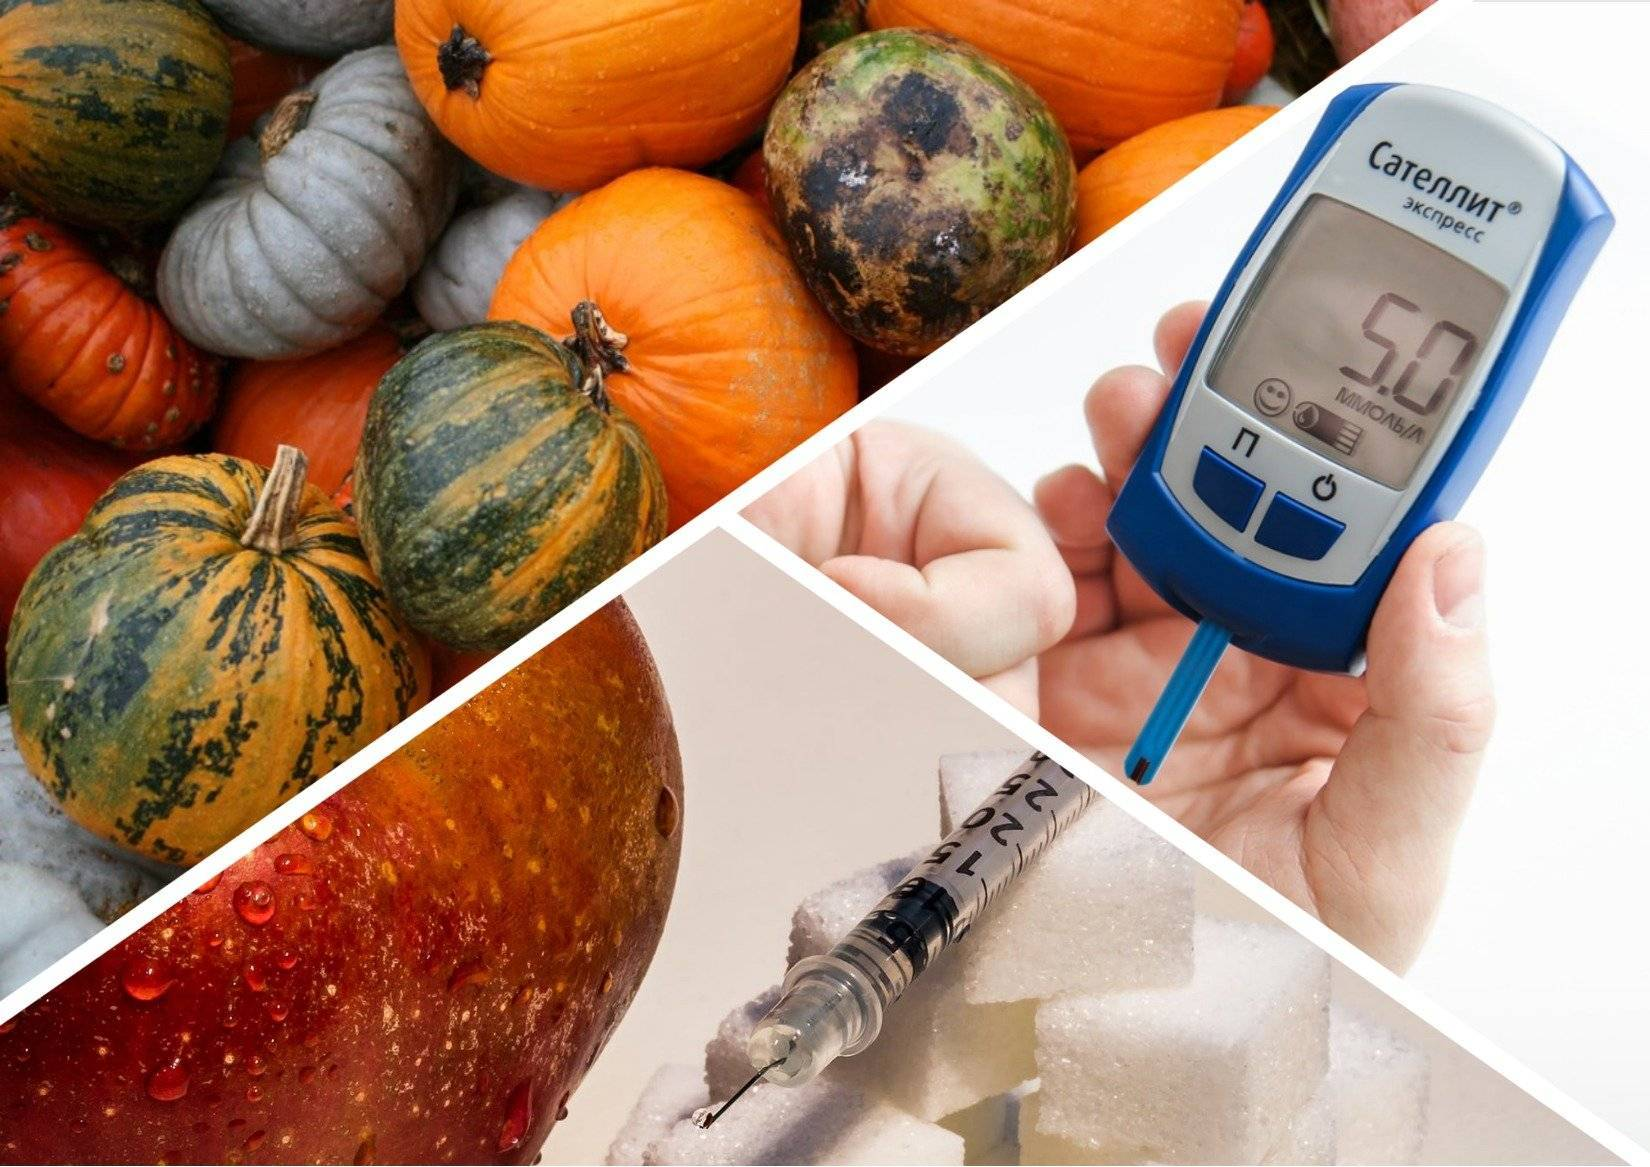 Тыква при диабете: польза и вред, можно ли есть